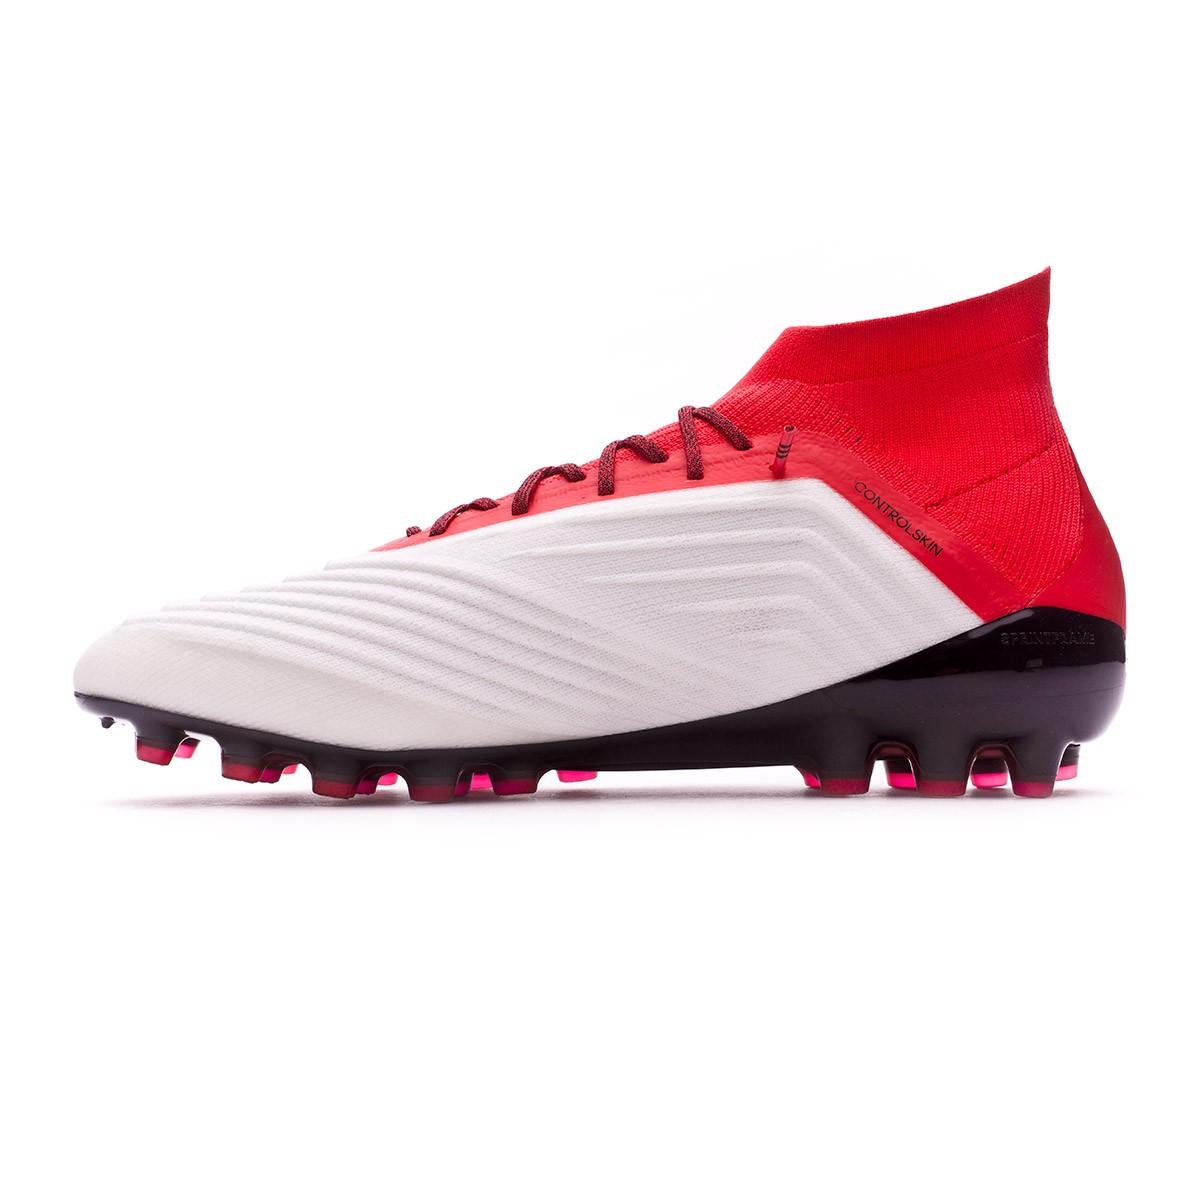 ... cheap boot adidas predator 18.1 ag white core black real coral football  ac54e 2ebee 3cc6eeff7078e